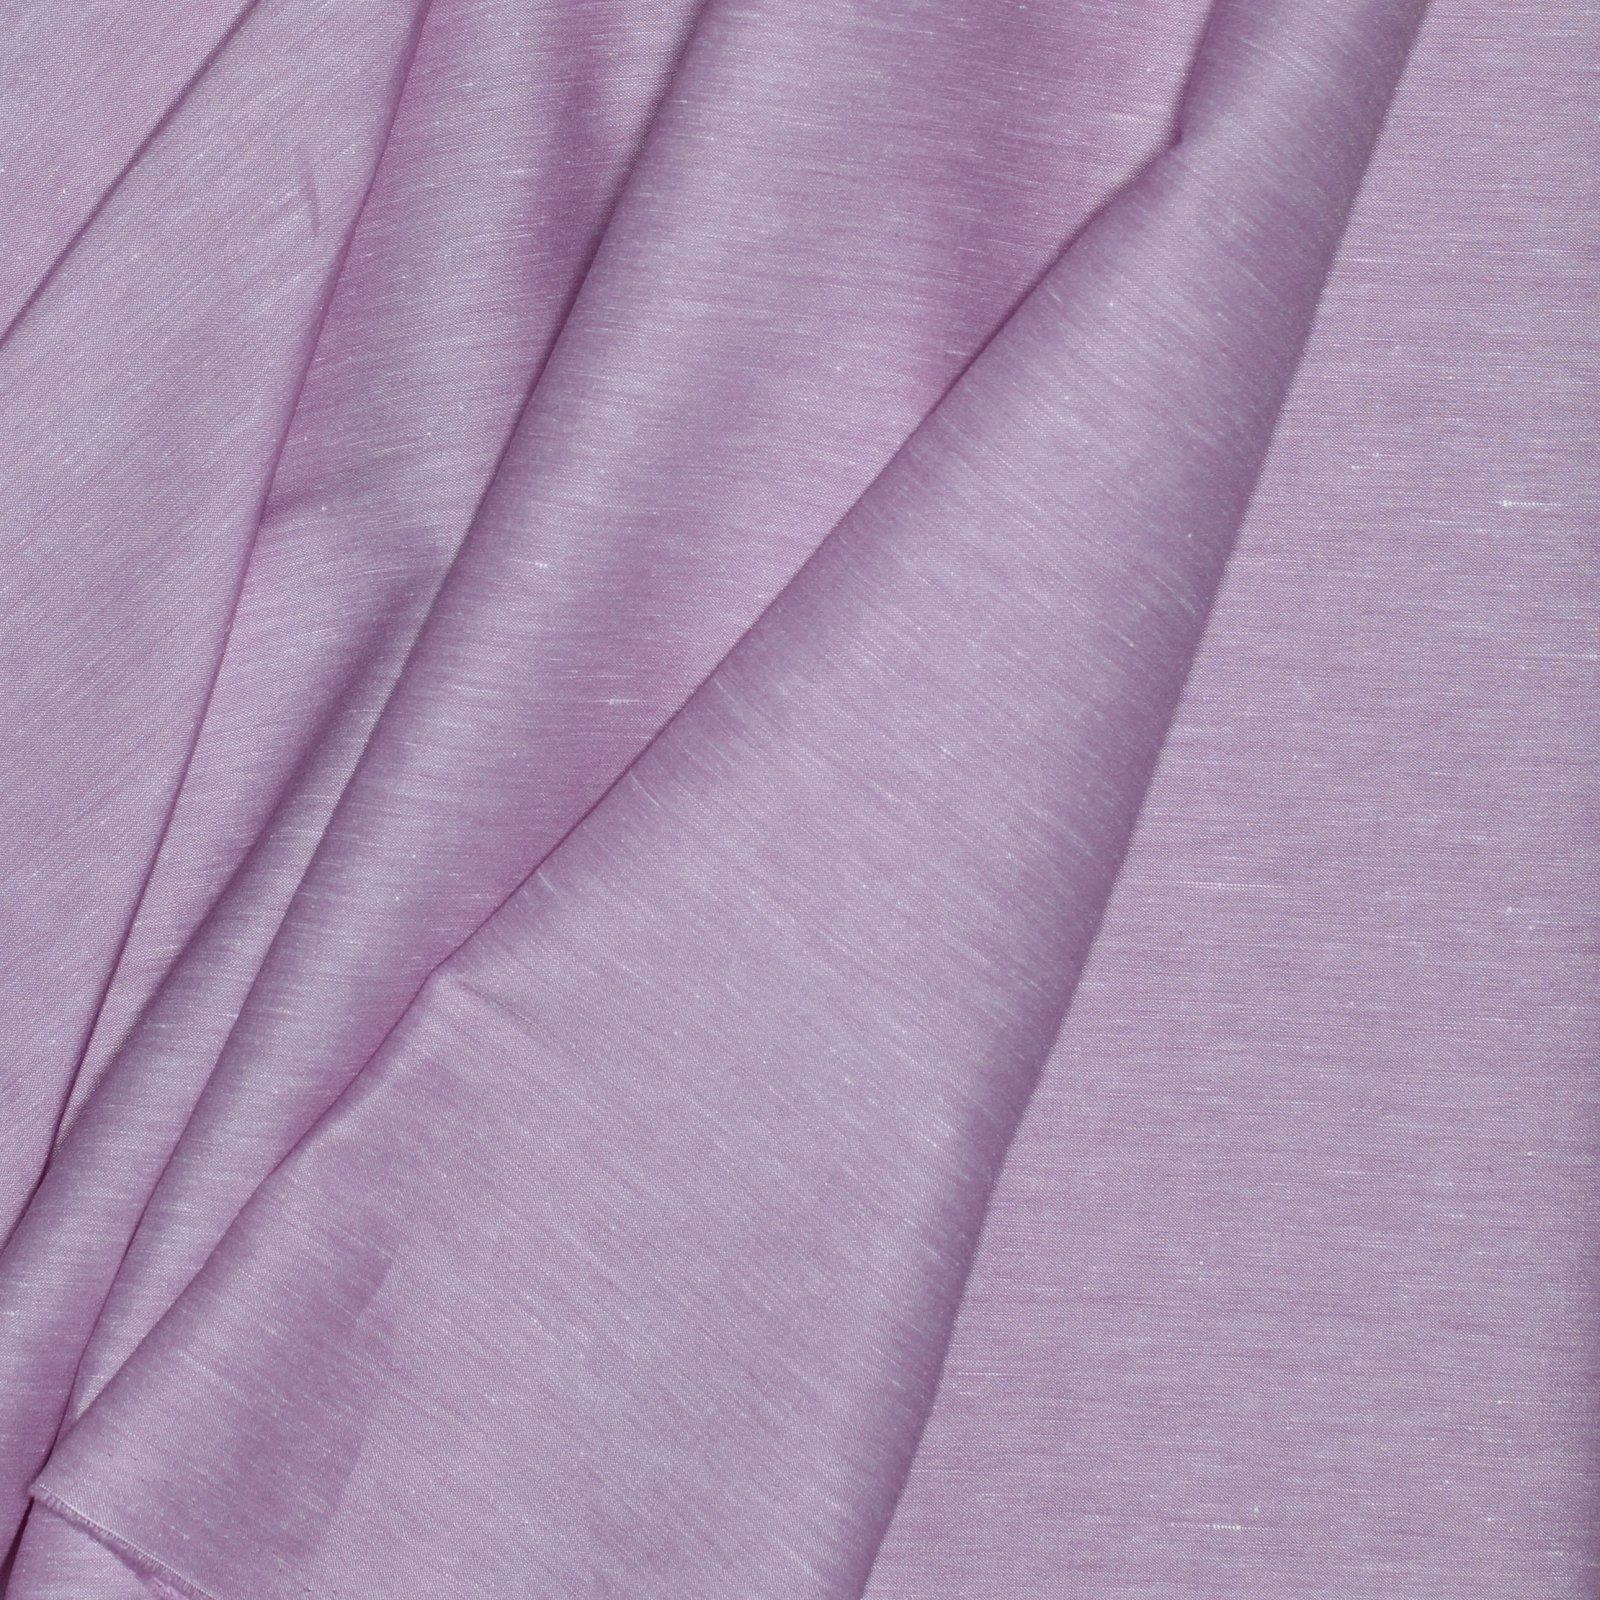 Pink Italian Linen/Lycra